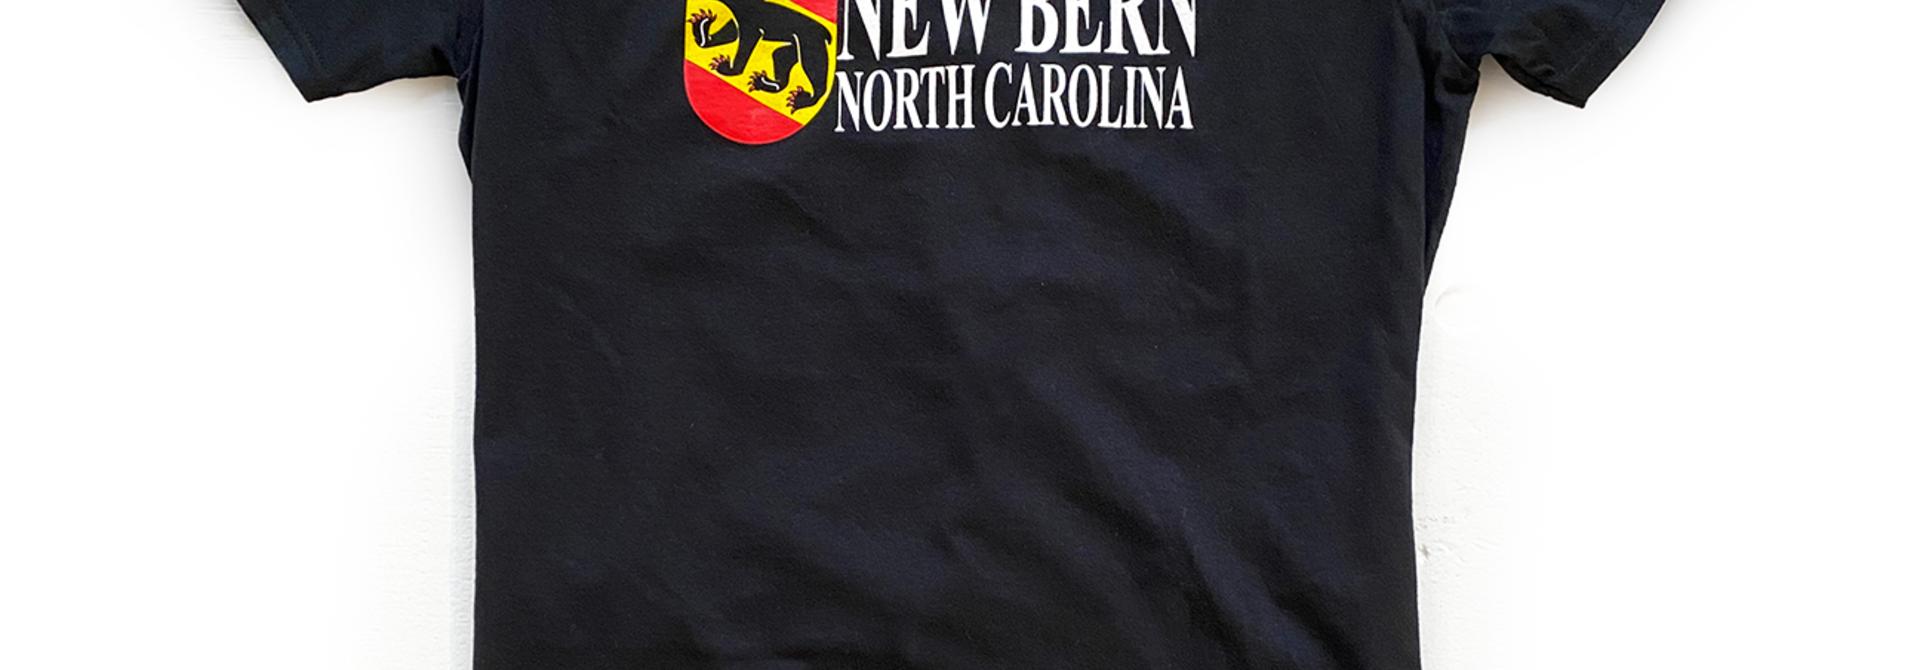 New Bern Bear Shield T-Shirt, Black